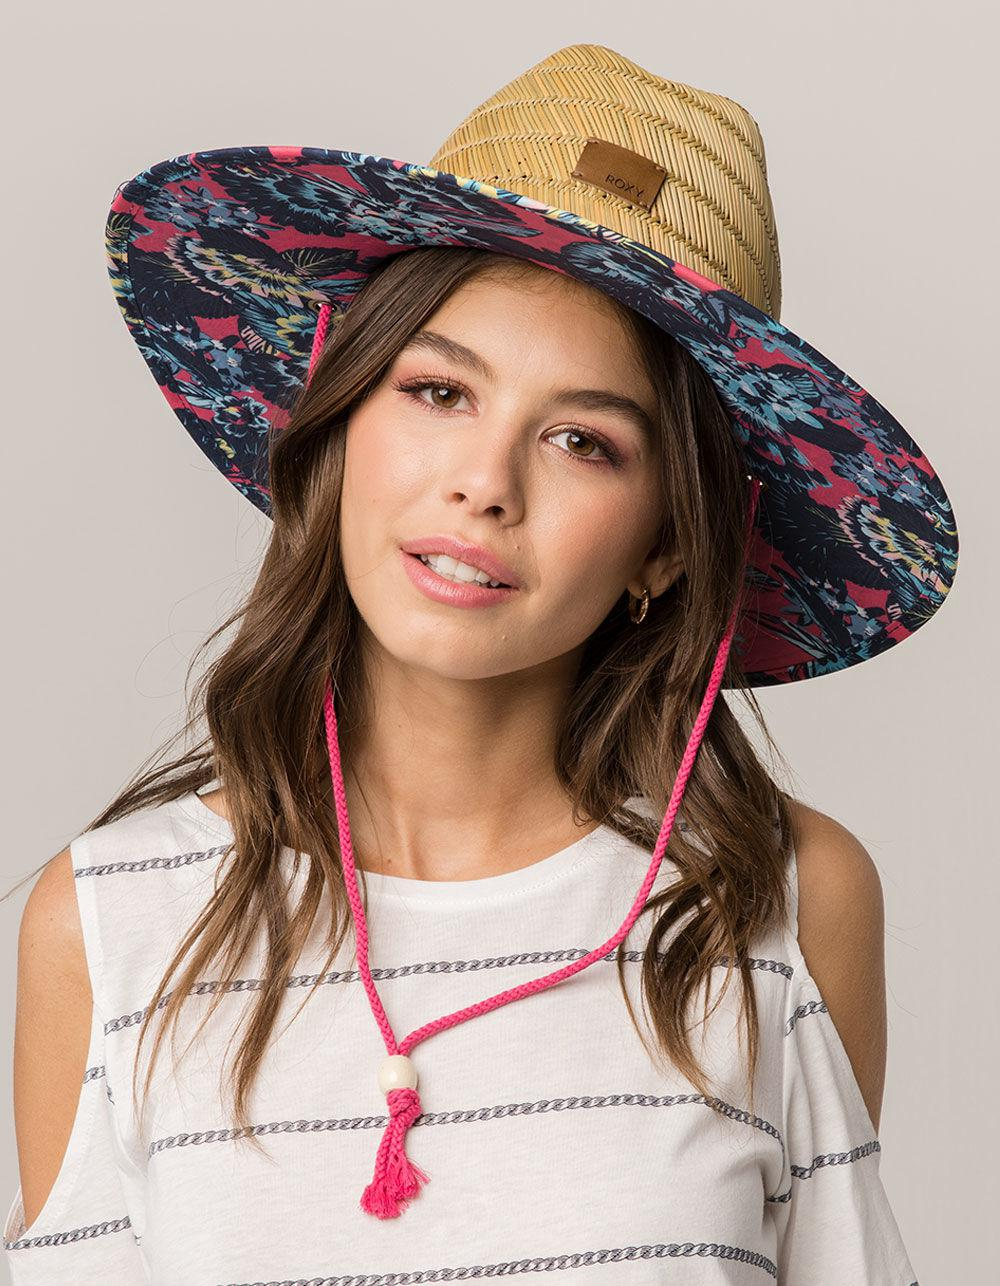 59603222a5c3b6 Roxy Tomboy Print Womens Lifeguard Hat in Pink - Lyst